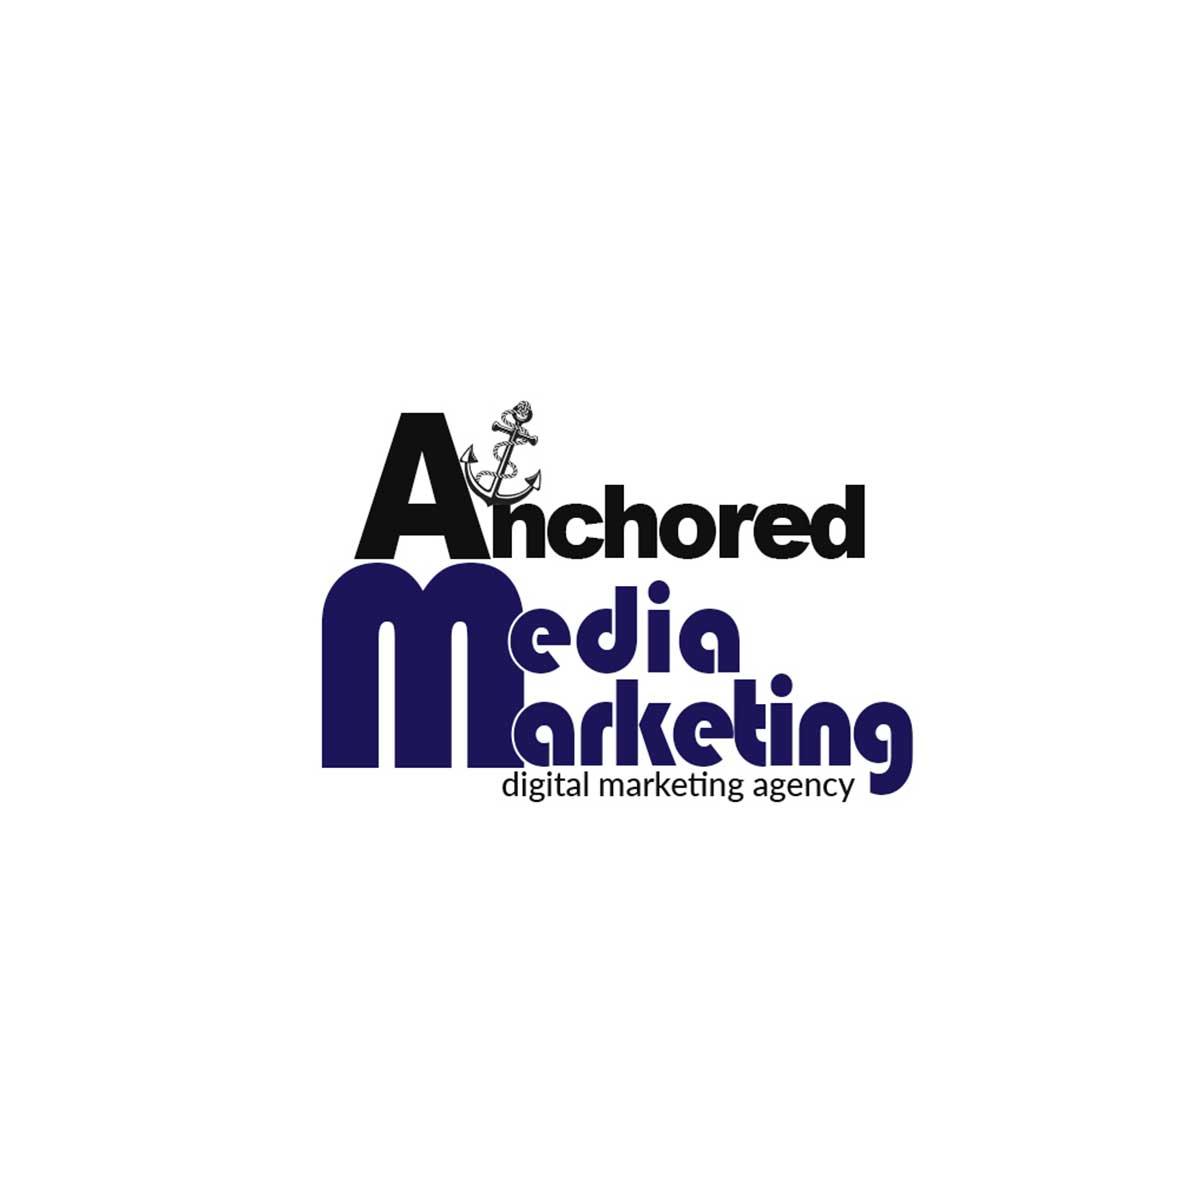 Anchored Media Marketing SEO and Online Marketing